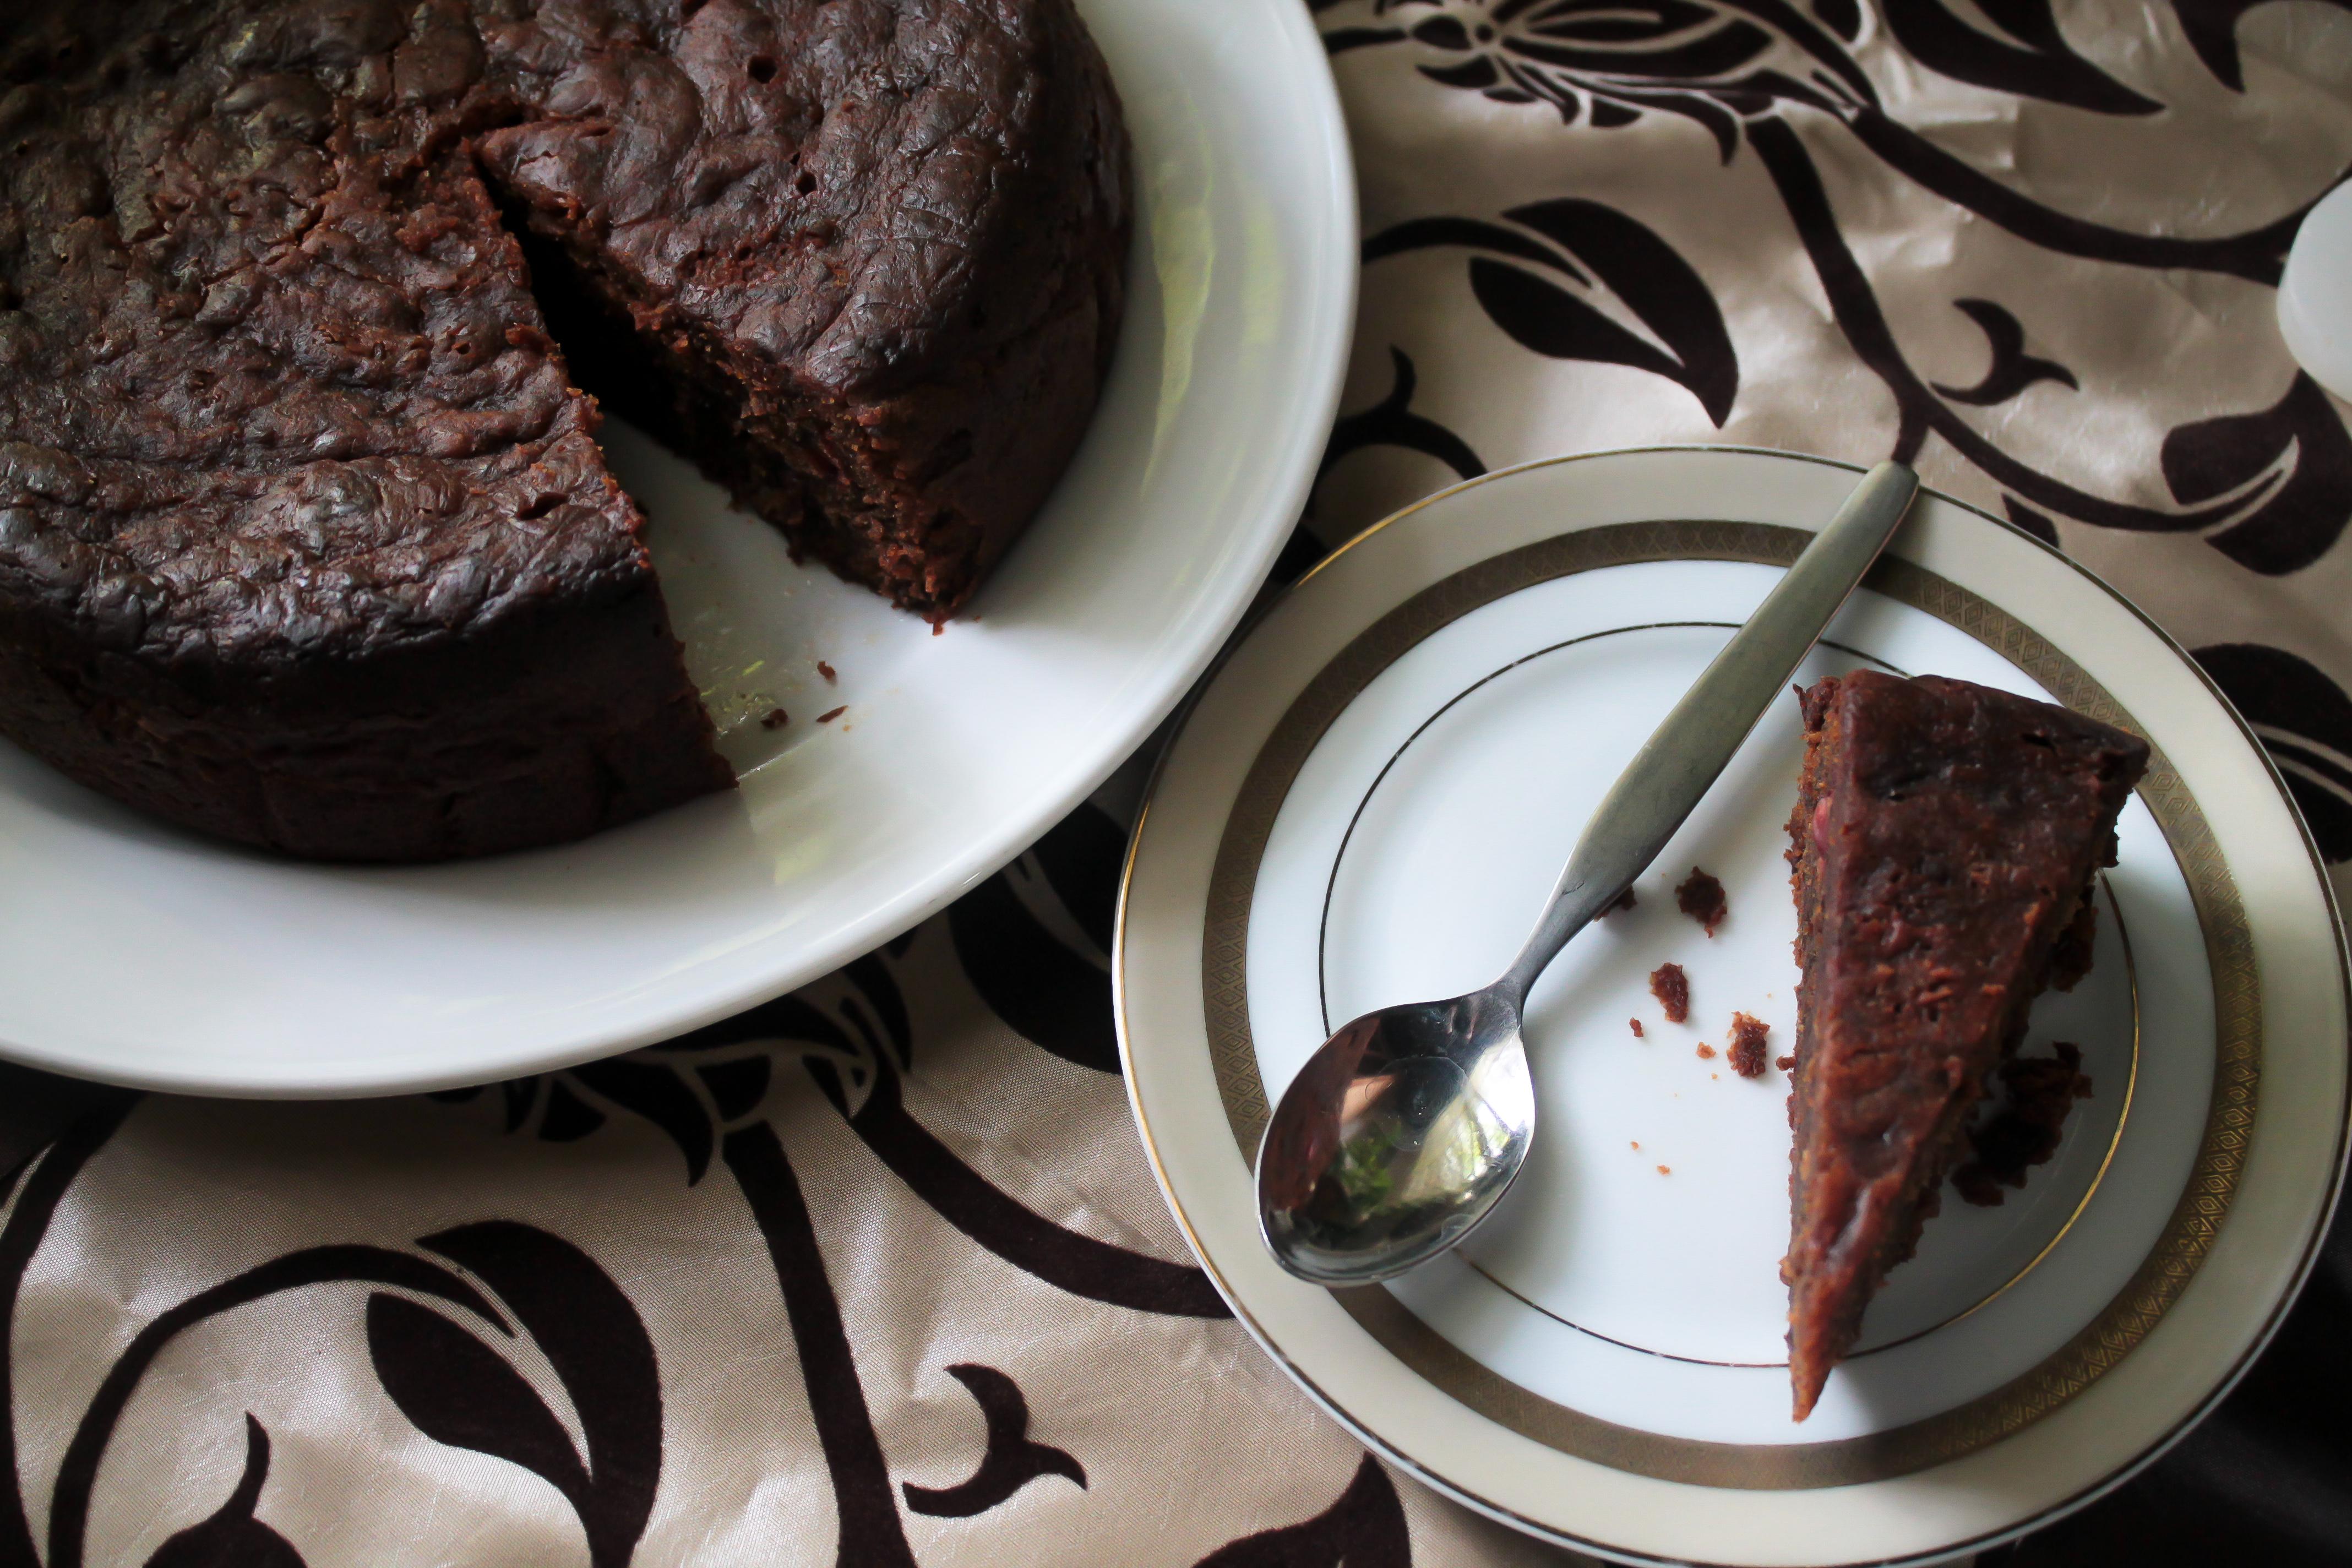 Gluten-free black cake